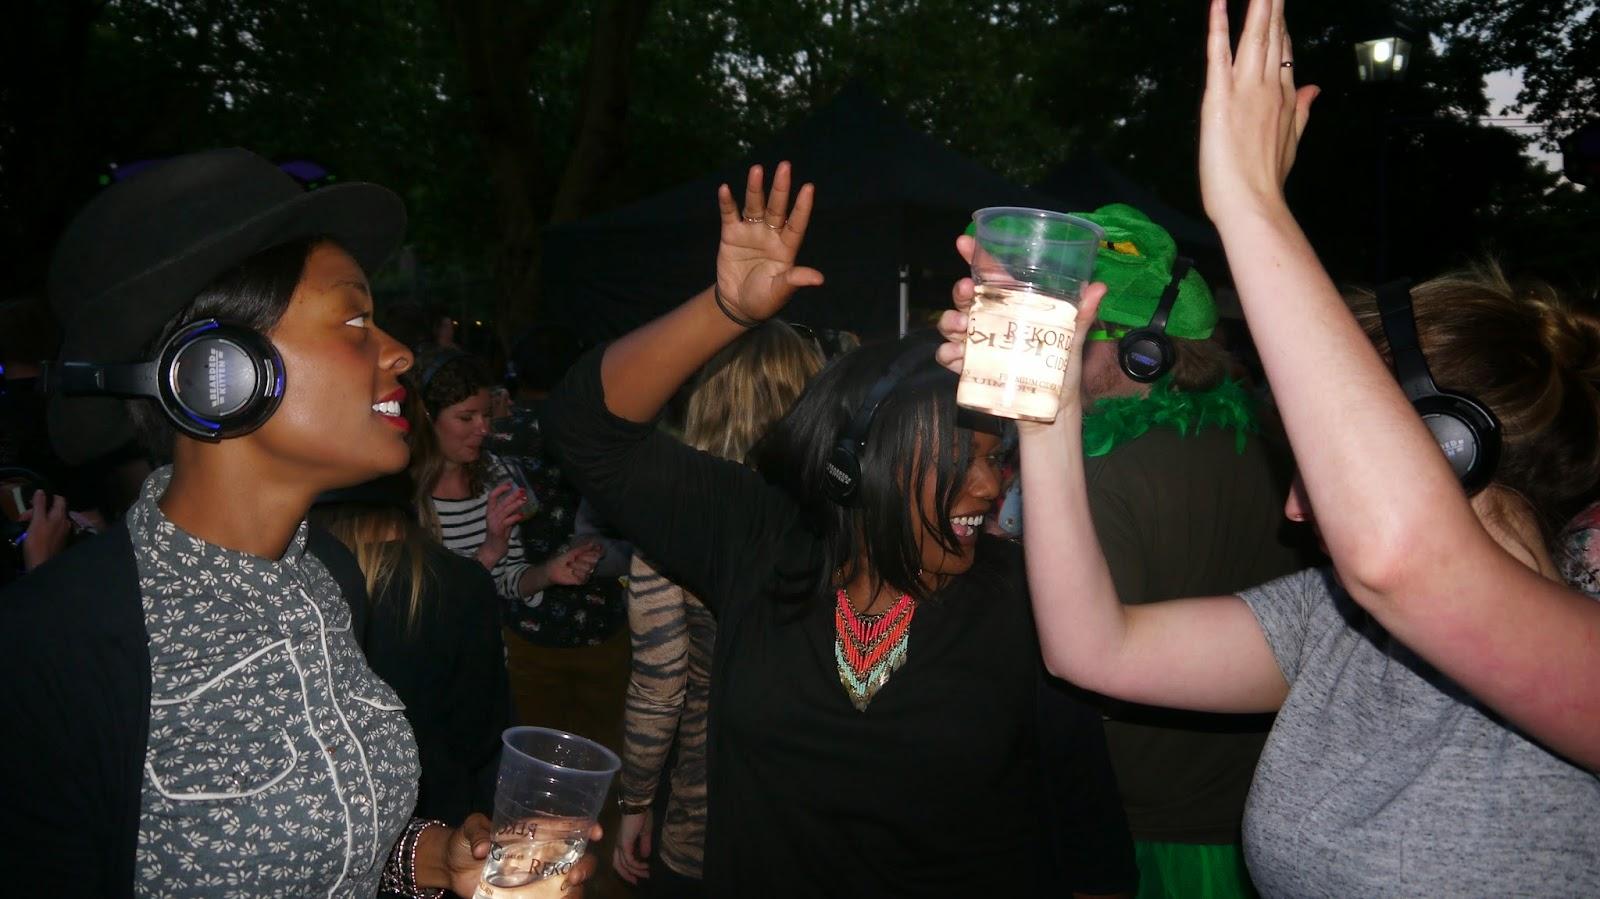 London Zoo lates silent disco